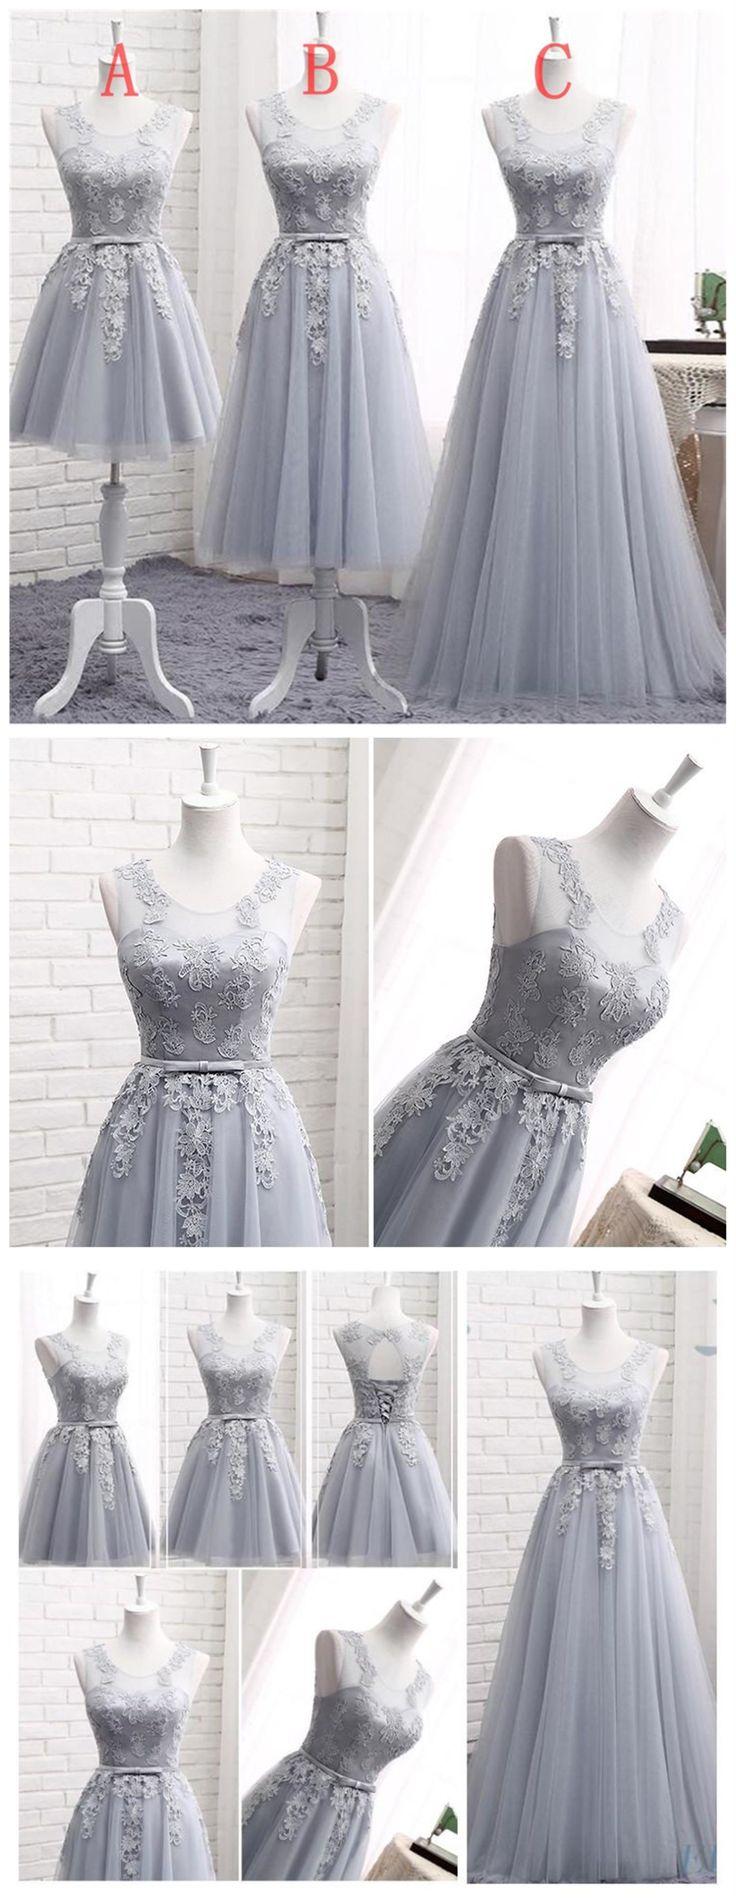 Gray Lace A line Long Bridesmaid Dresses, Cheap Custom Long Bridesmaid Dresses, Affordable Bridesmaid Gowns, BD019